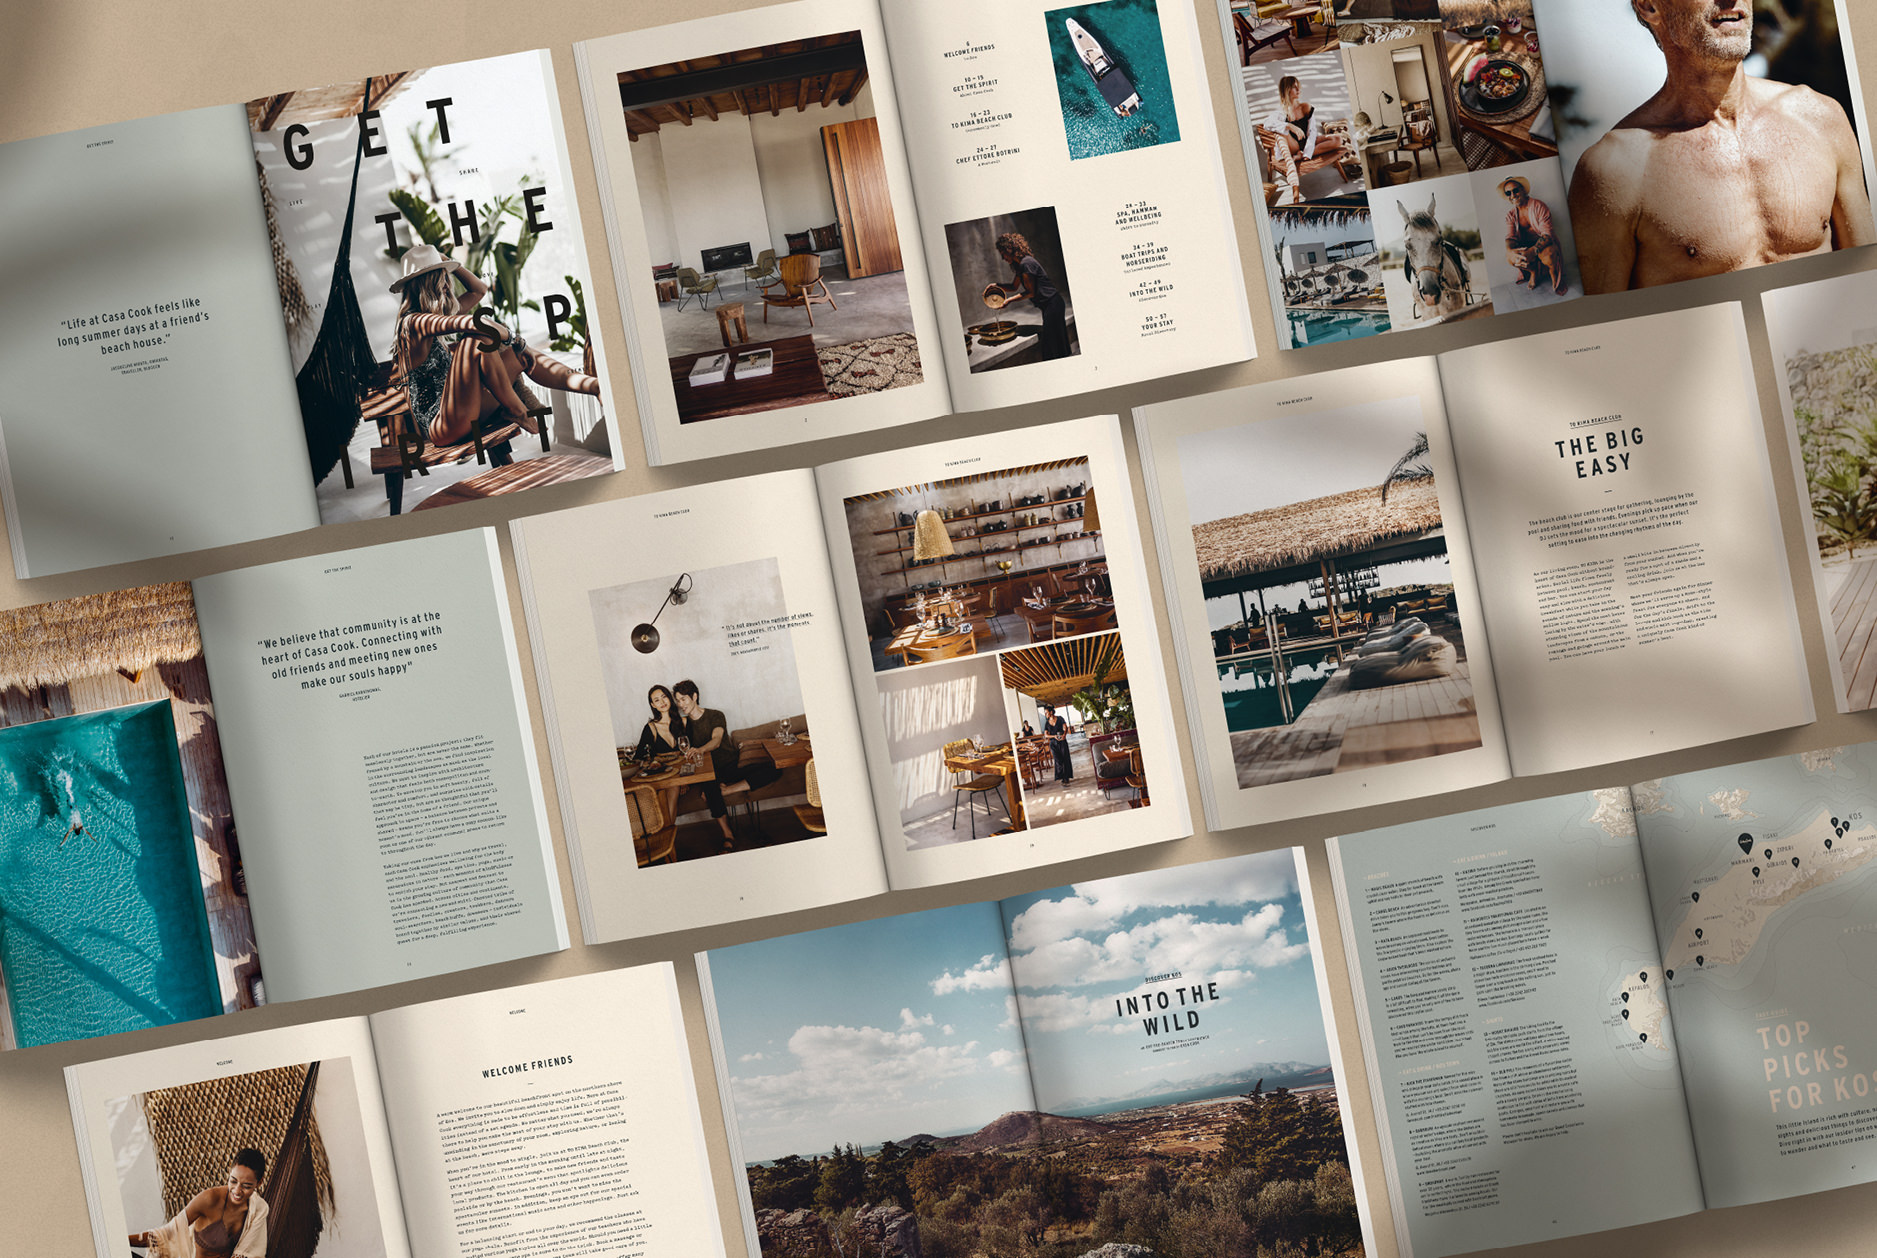 34_Casa_Cook_Kos_Branding_Slide_5_Lambs_and_Lions_Berlin